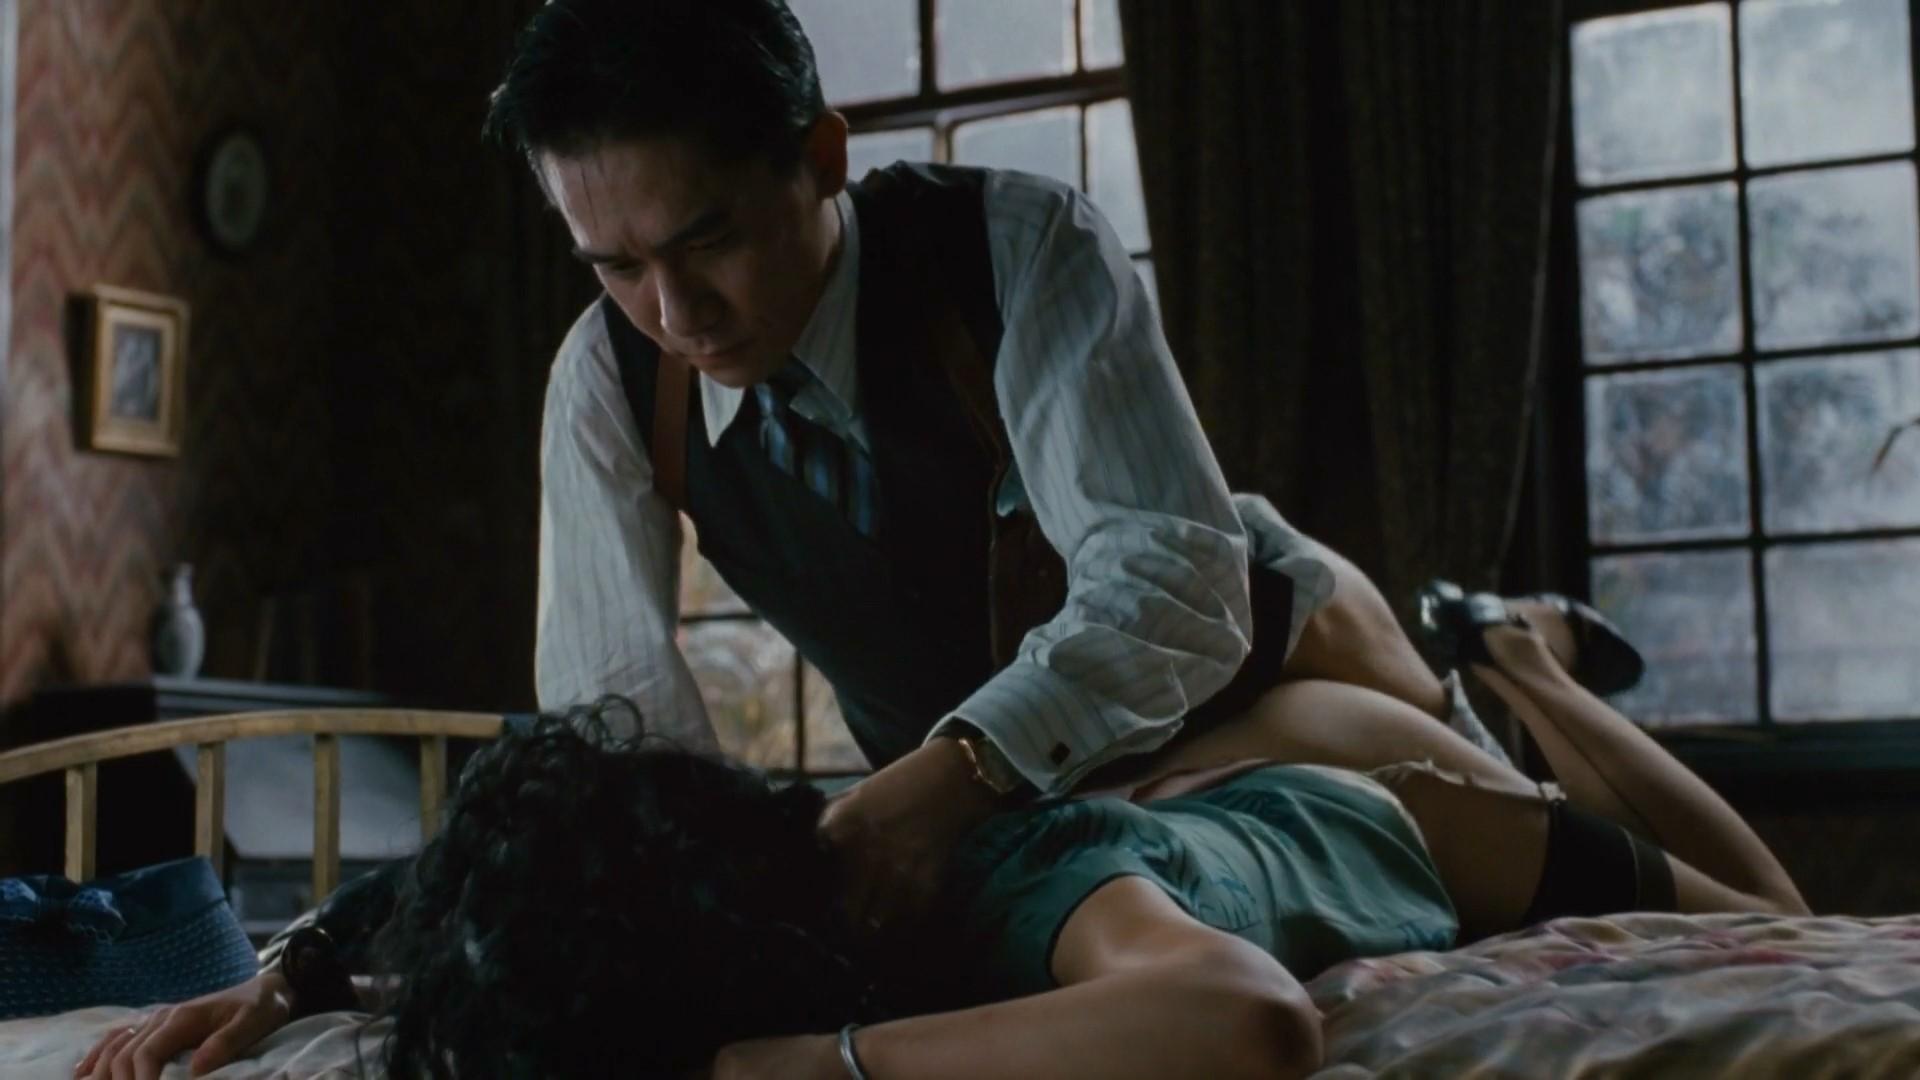 uncut movie sex scene clips